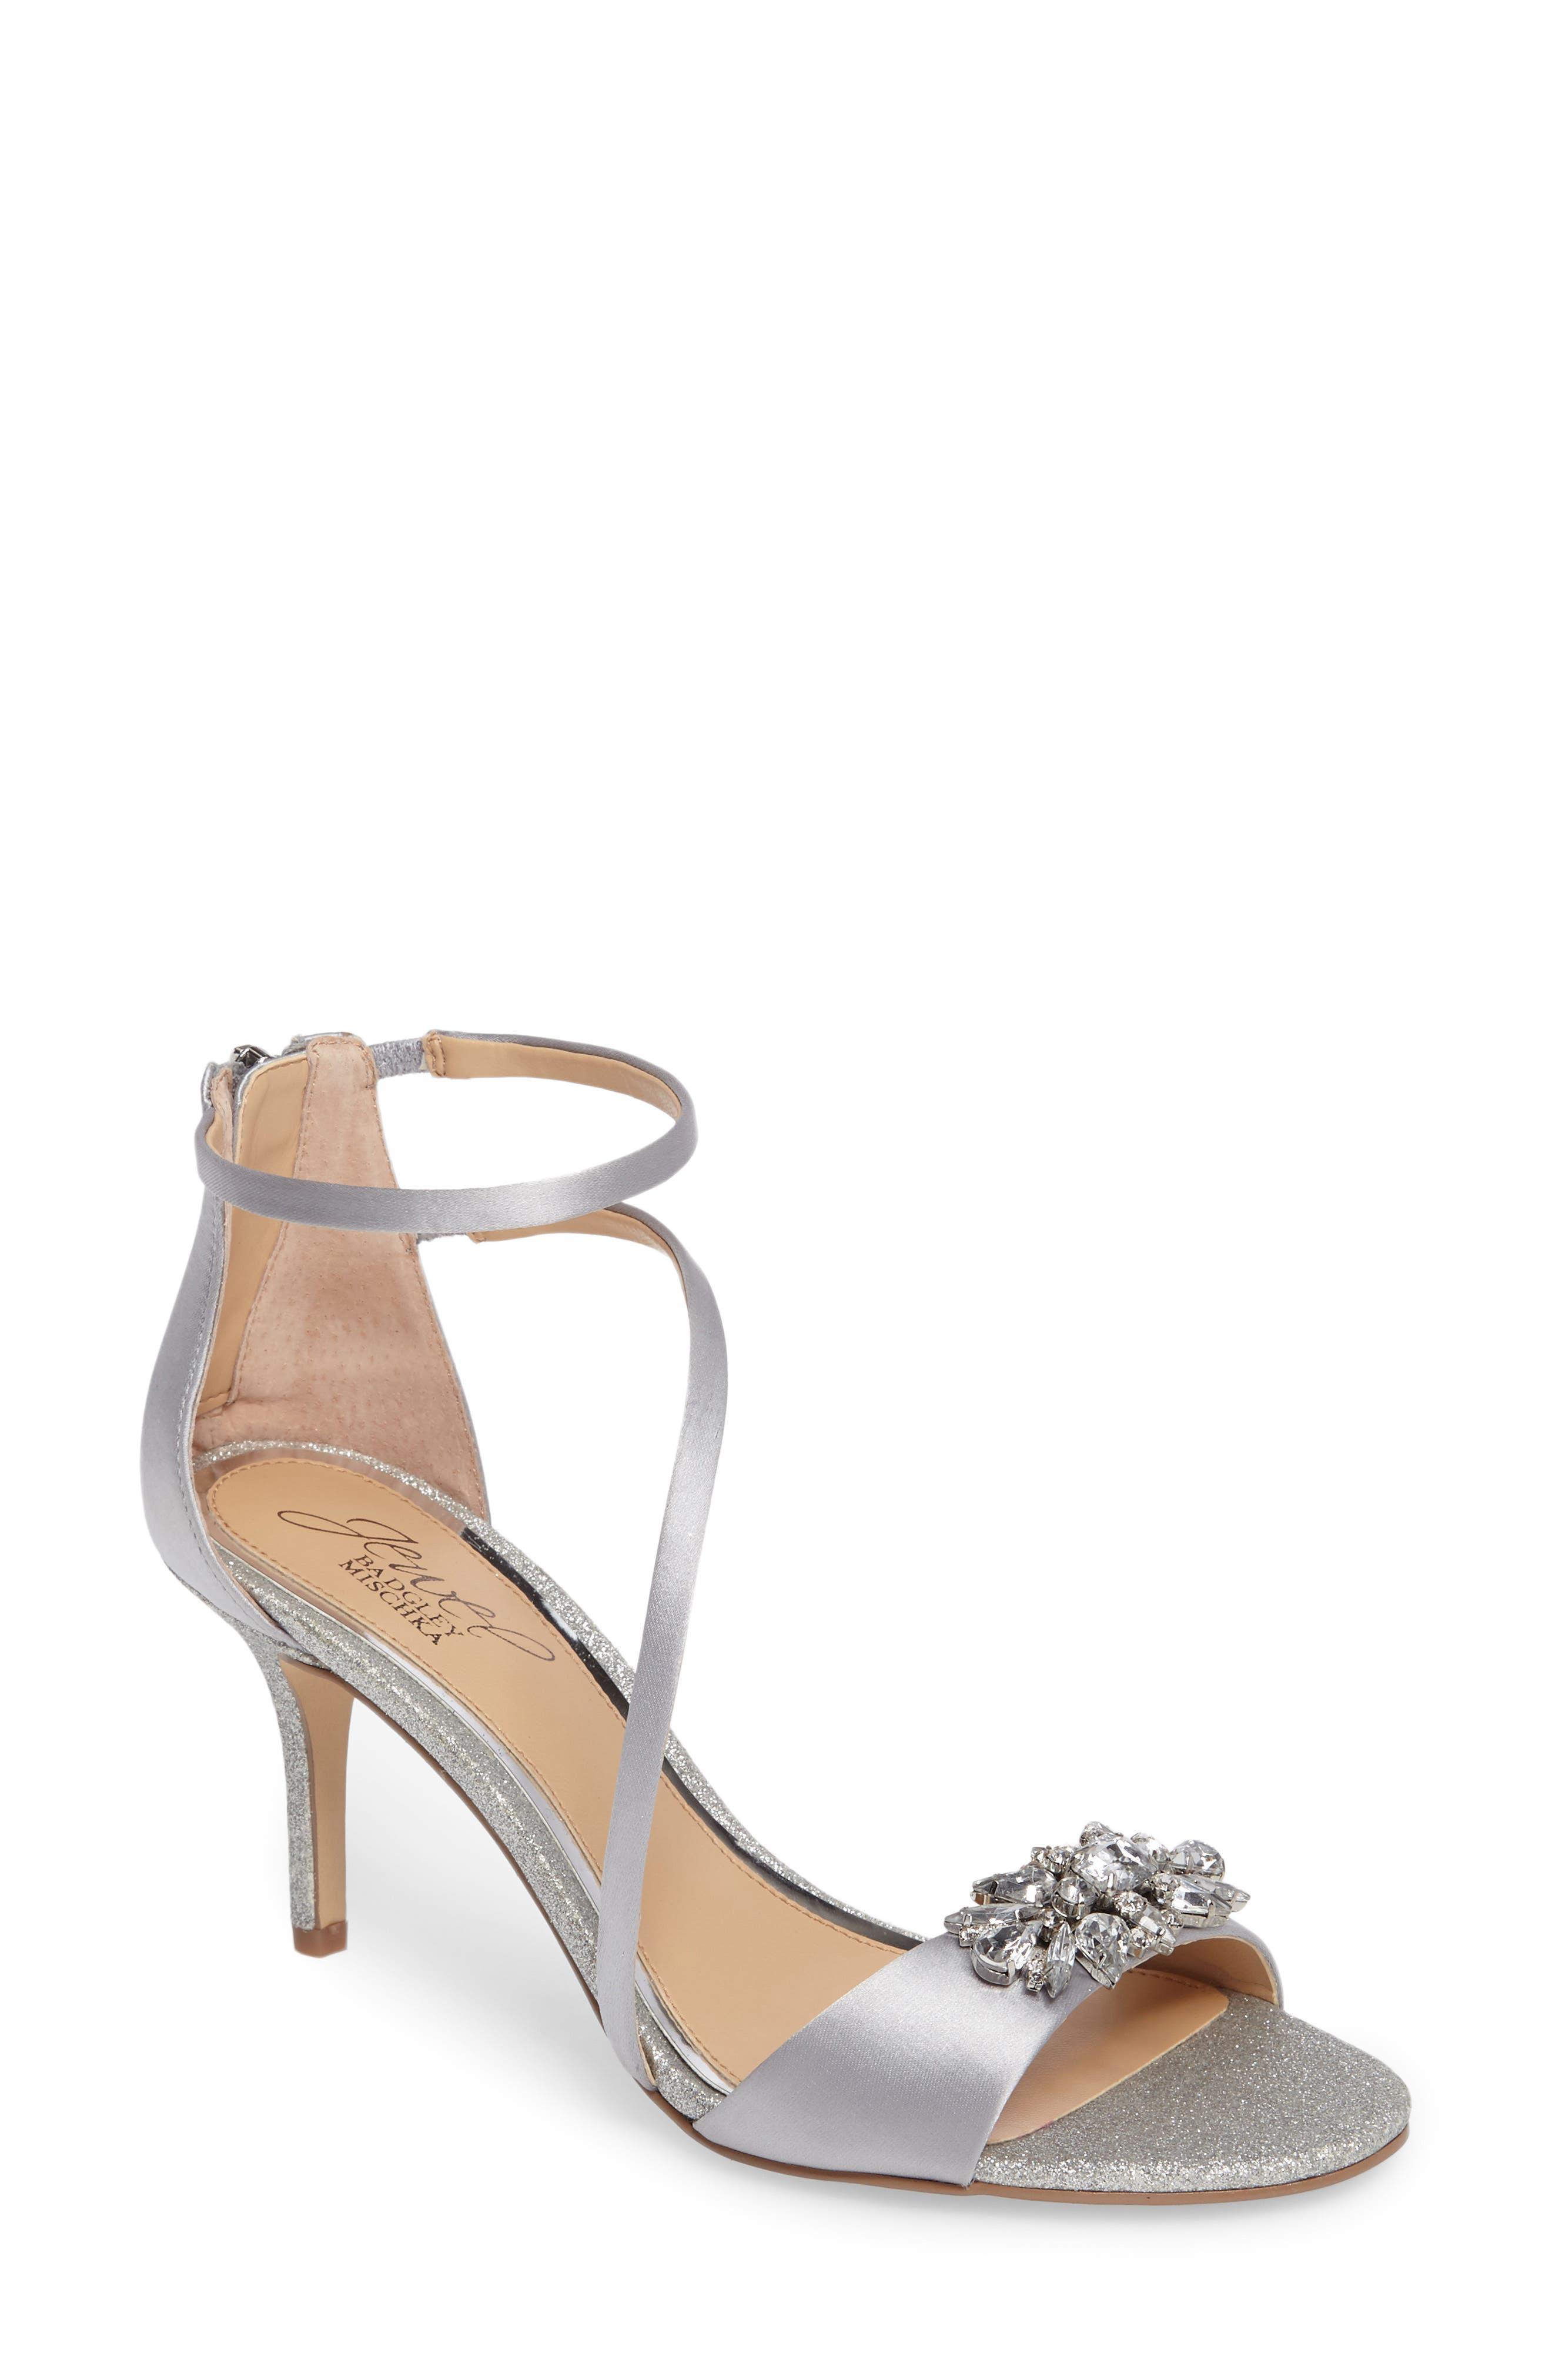 Alternate Image 1 Selected - Jewel Badgley Mischka Leighton Embellished Strappy Sandal (Women)